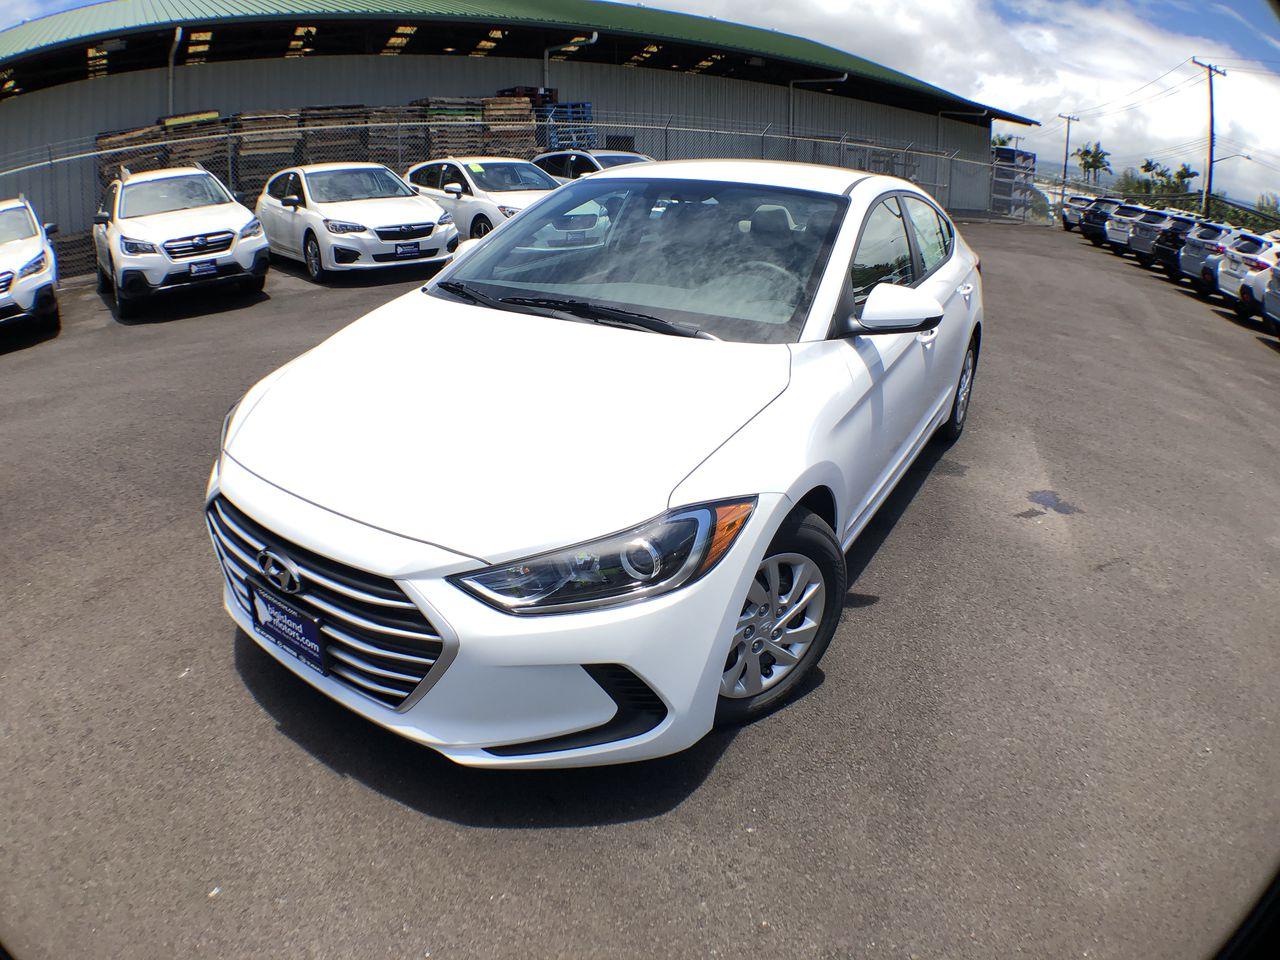 Big Island Motors >> Big Island Motors On Twitter The New Hyundai Elantra Is